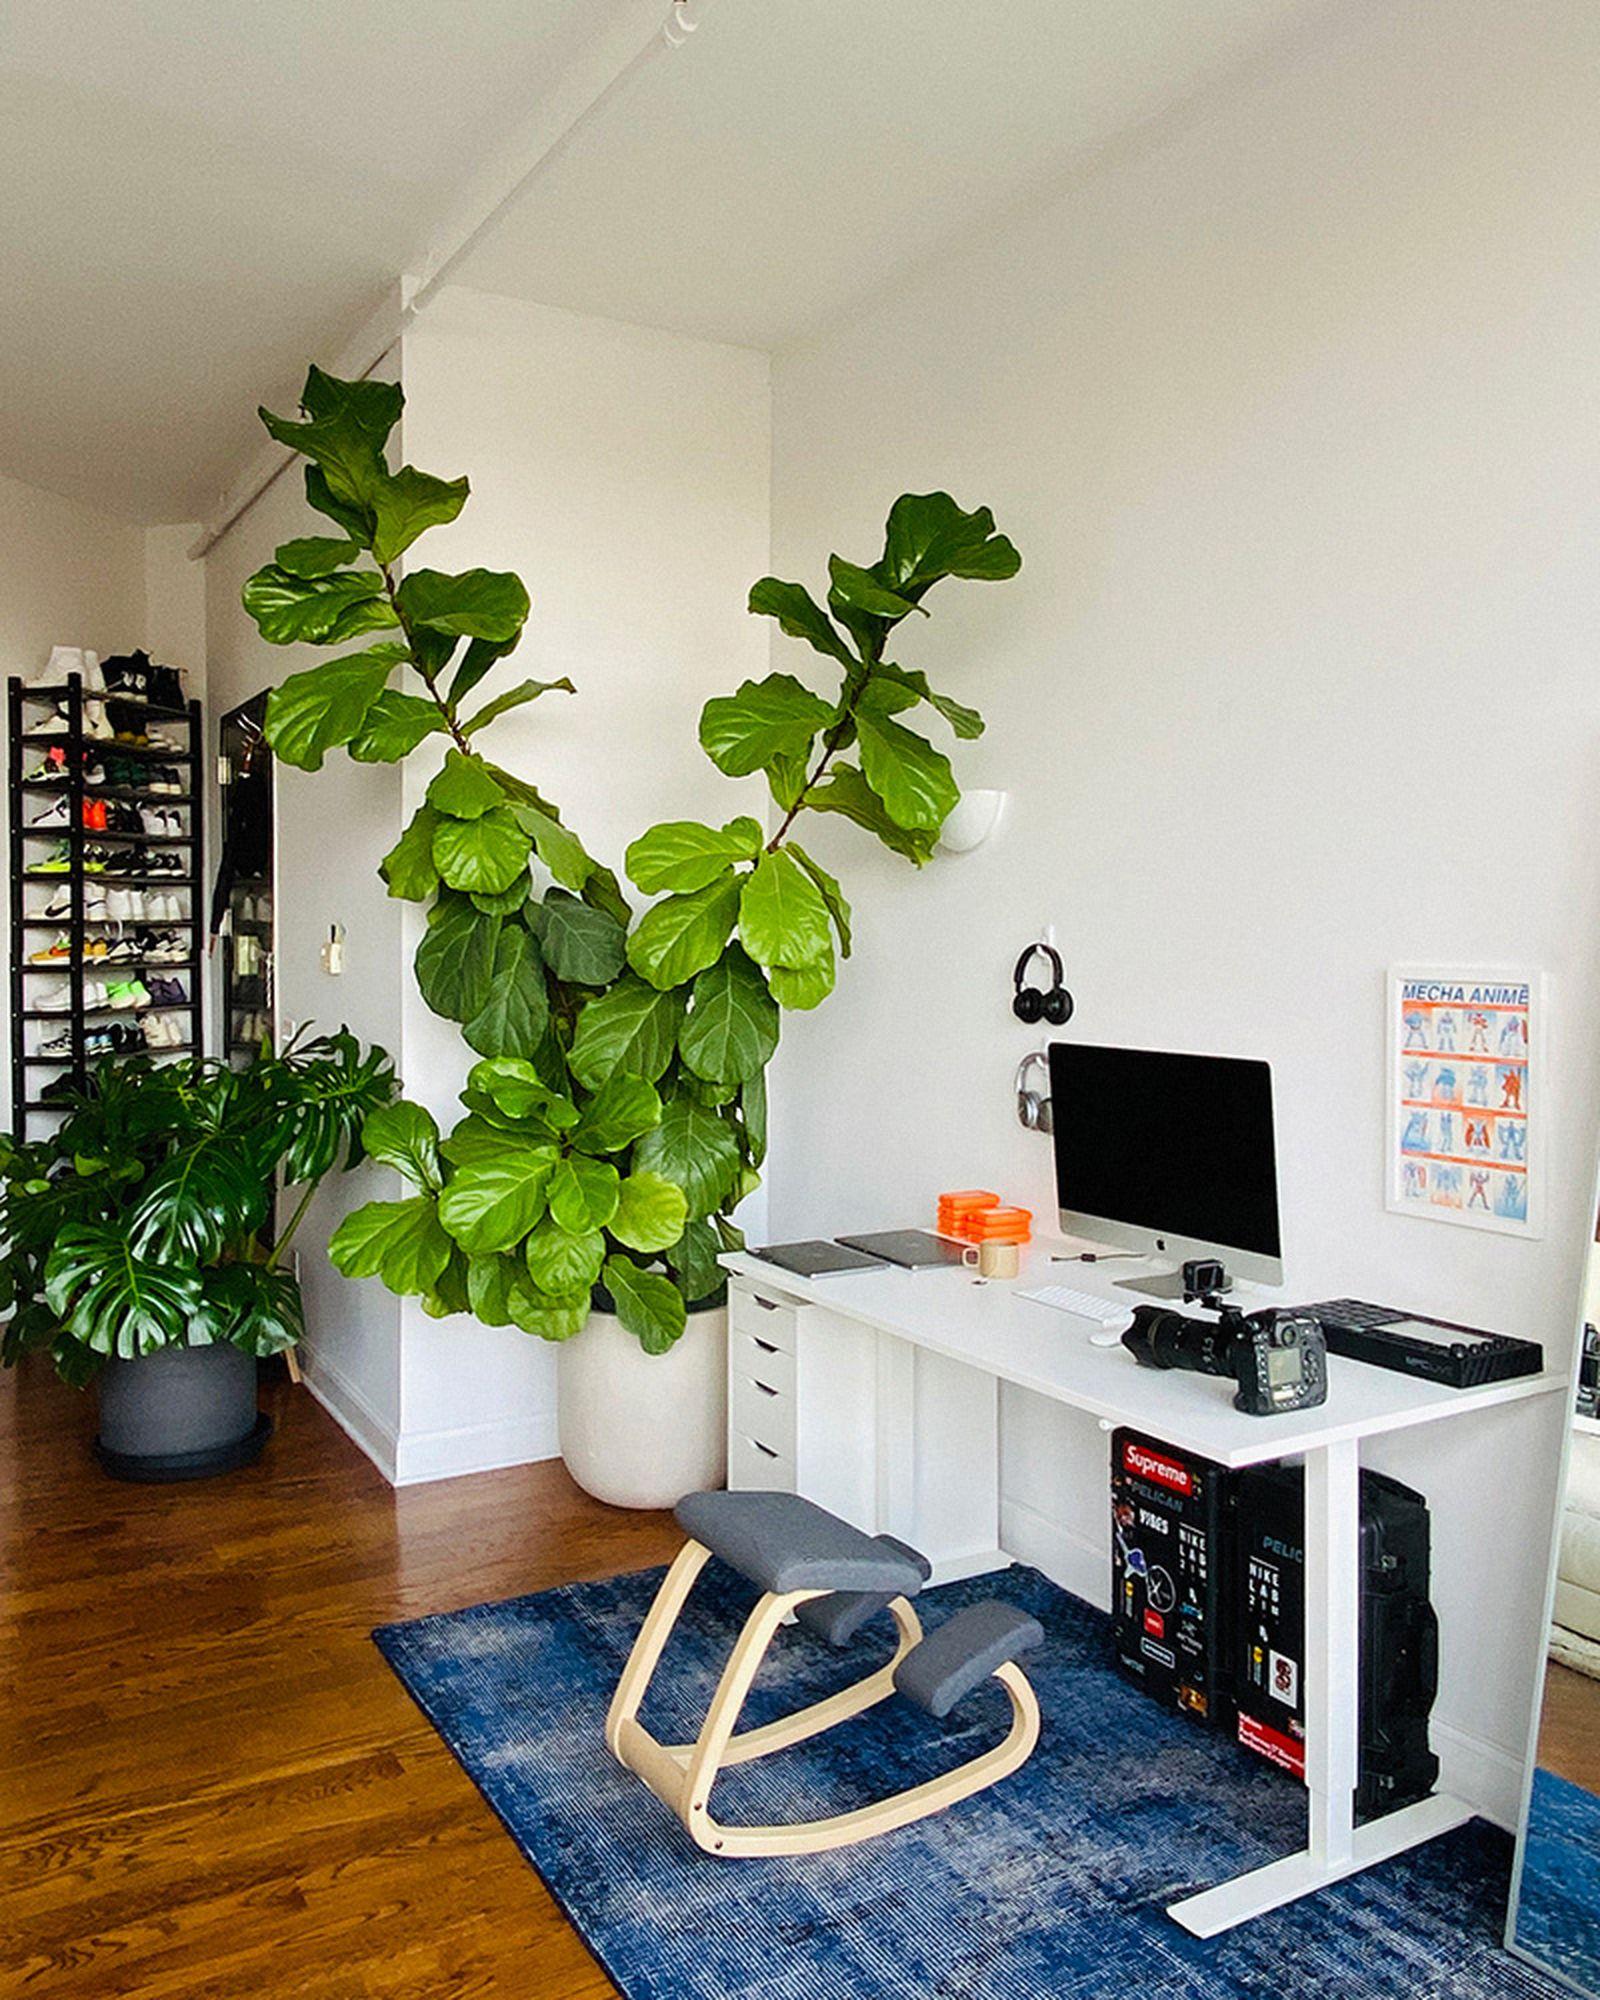 wfh-office-tour-look-inside-home-offices-tyler-joe-02